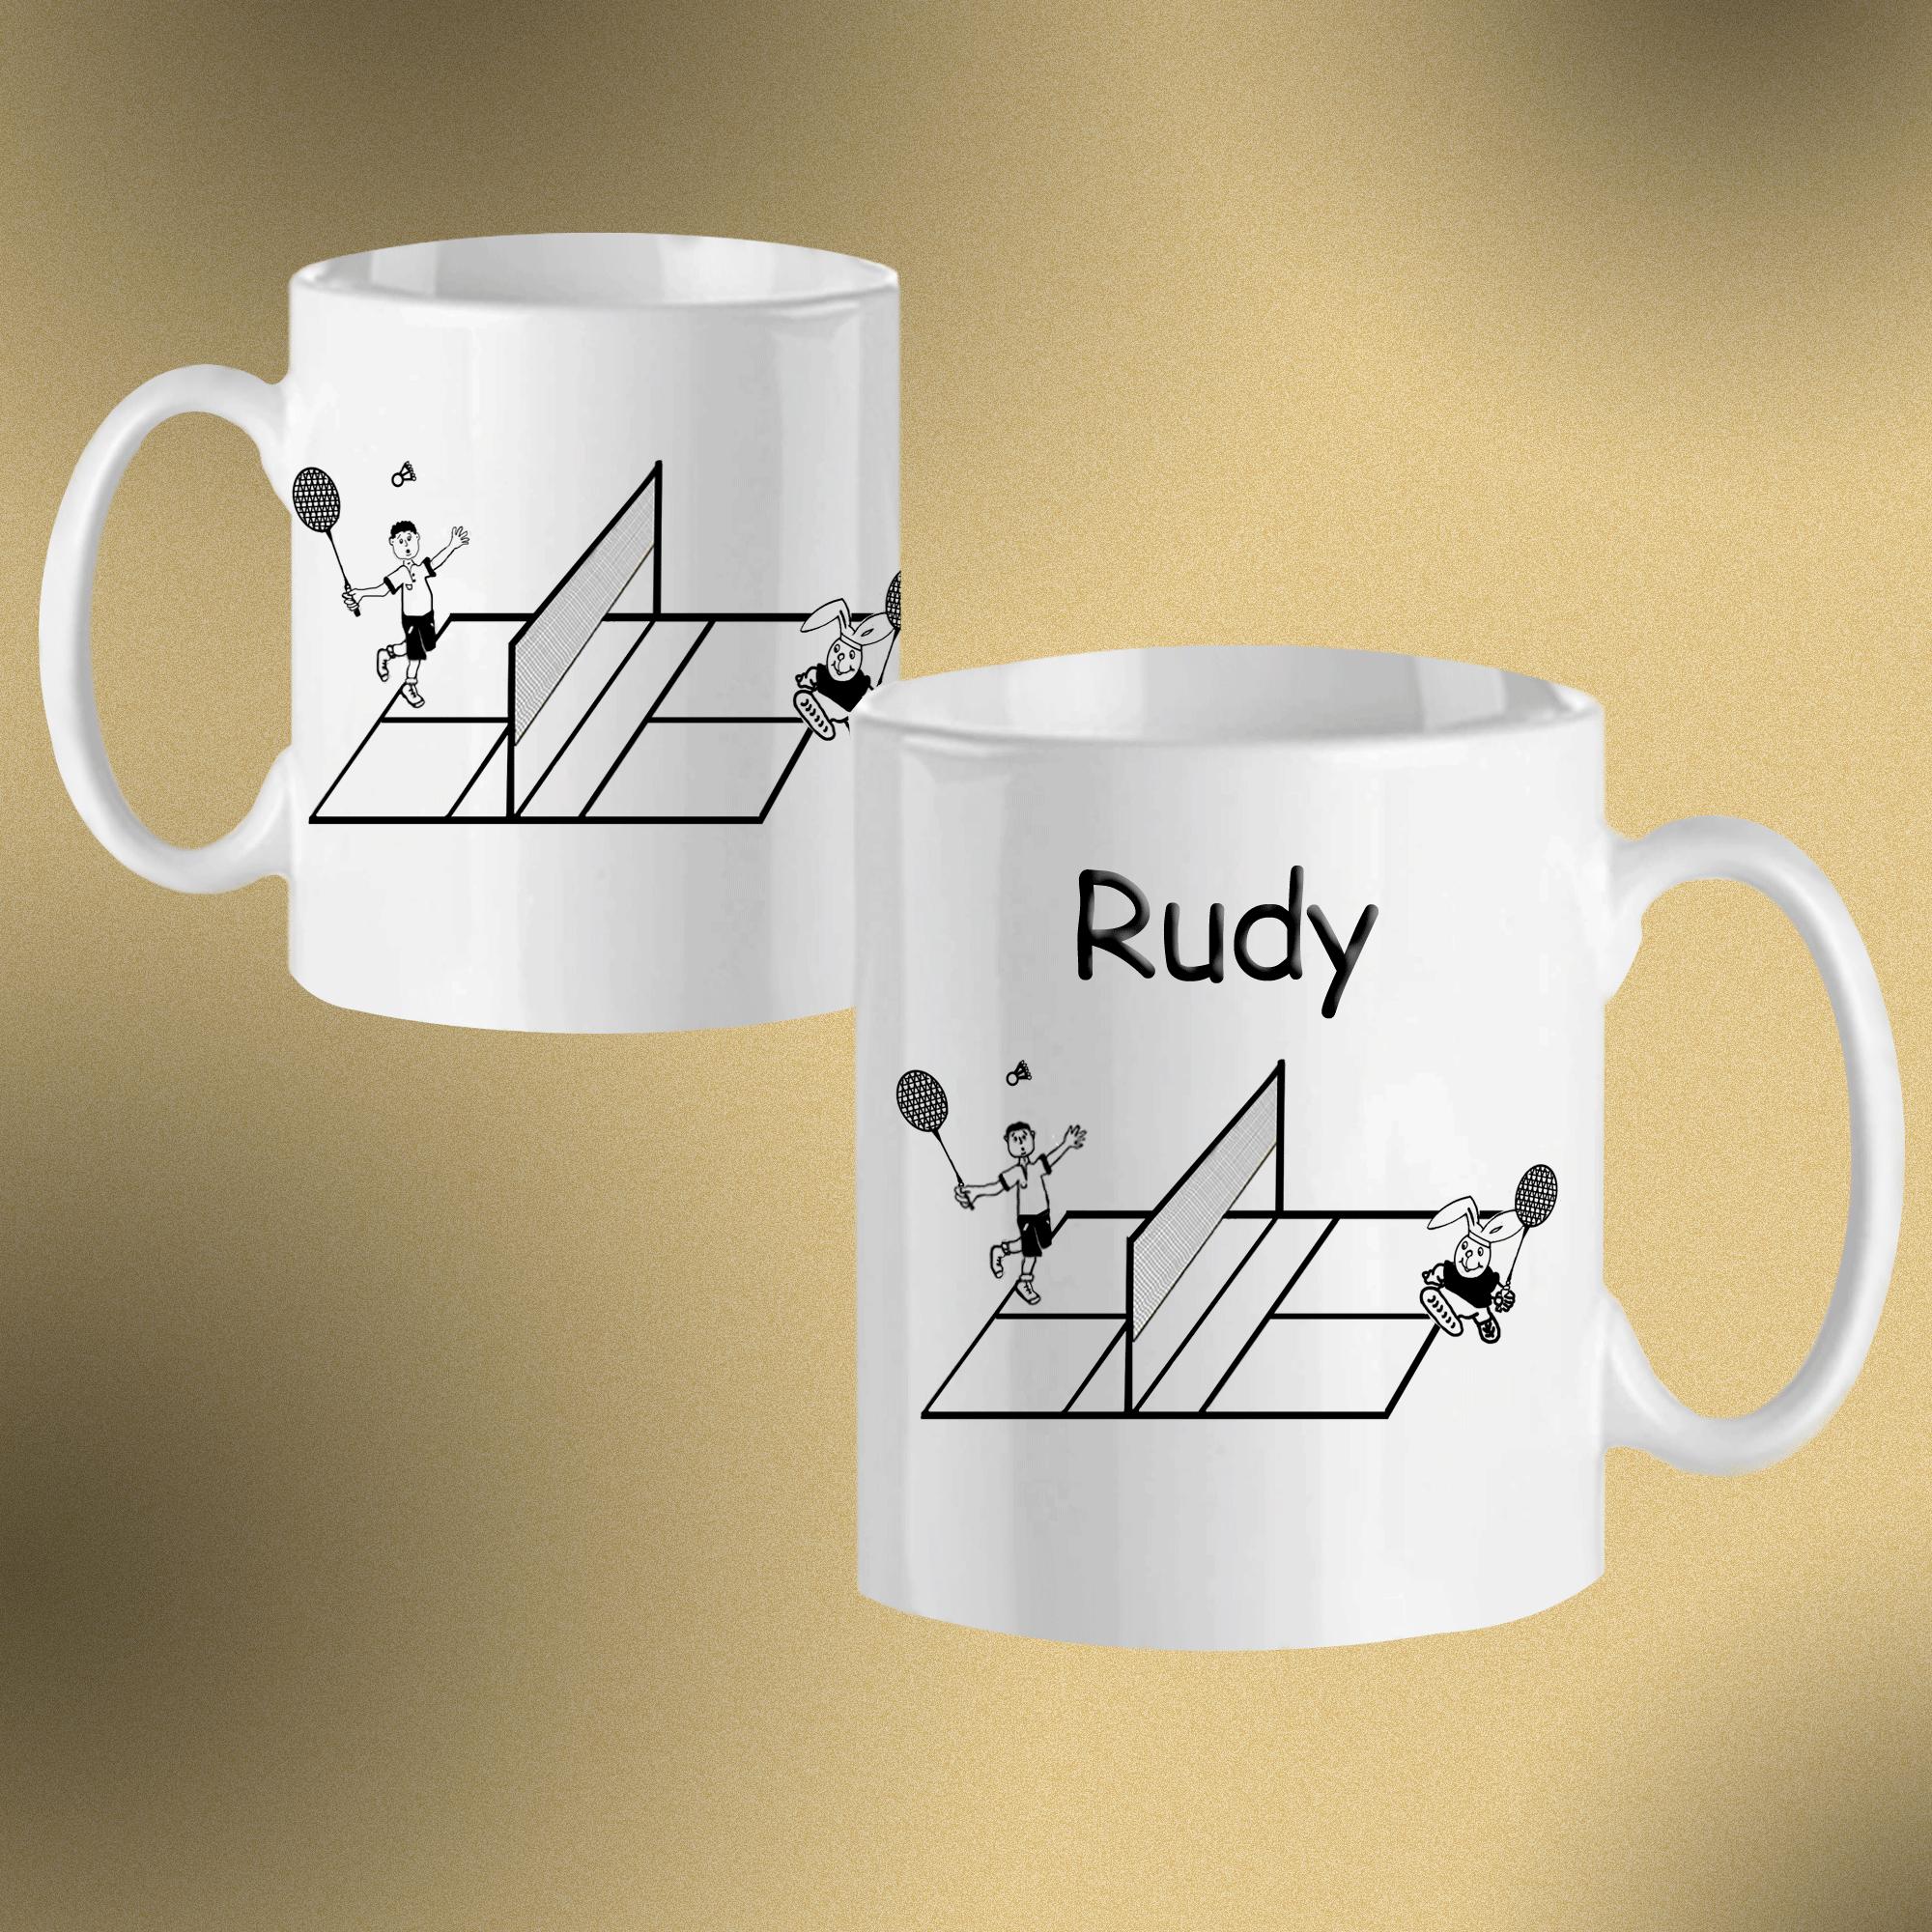 mug-blanc-badminton-personnalisable-personnalisation-personnalise-prenom-filet-raquette-volant-sport-rudy